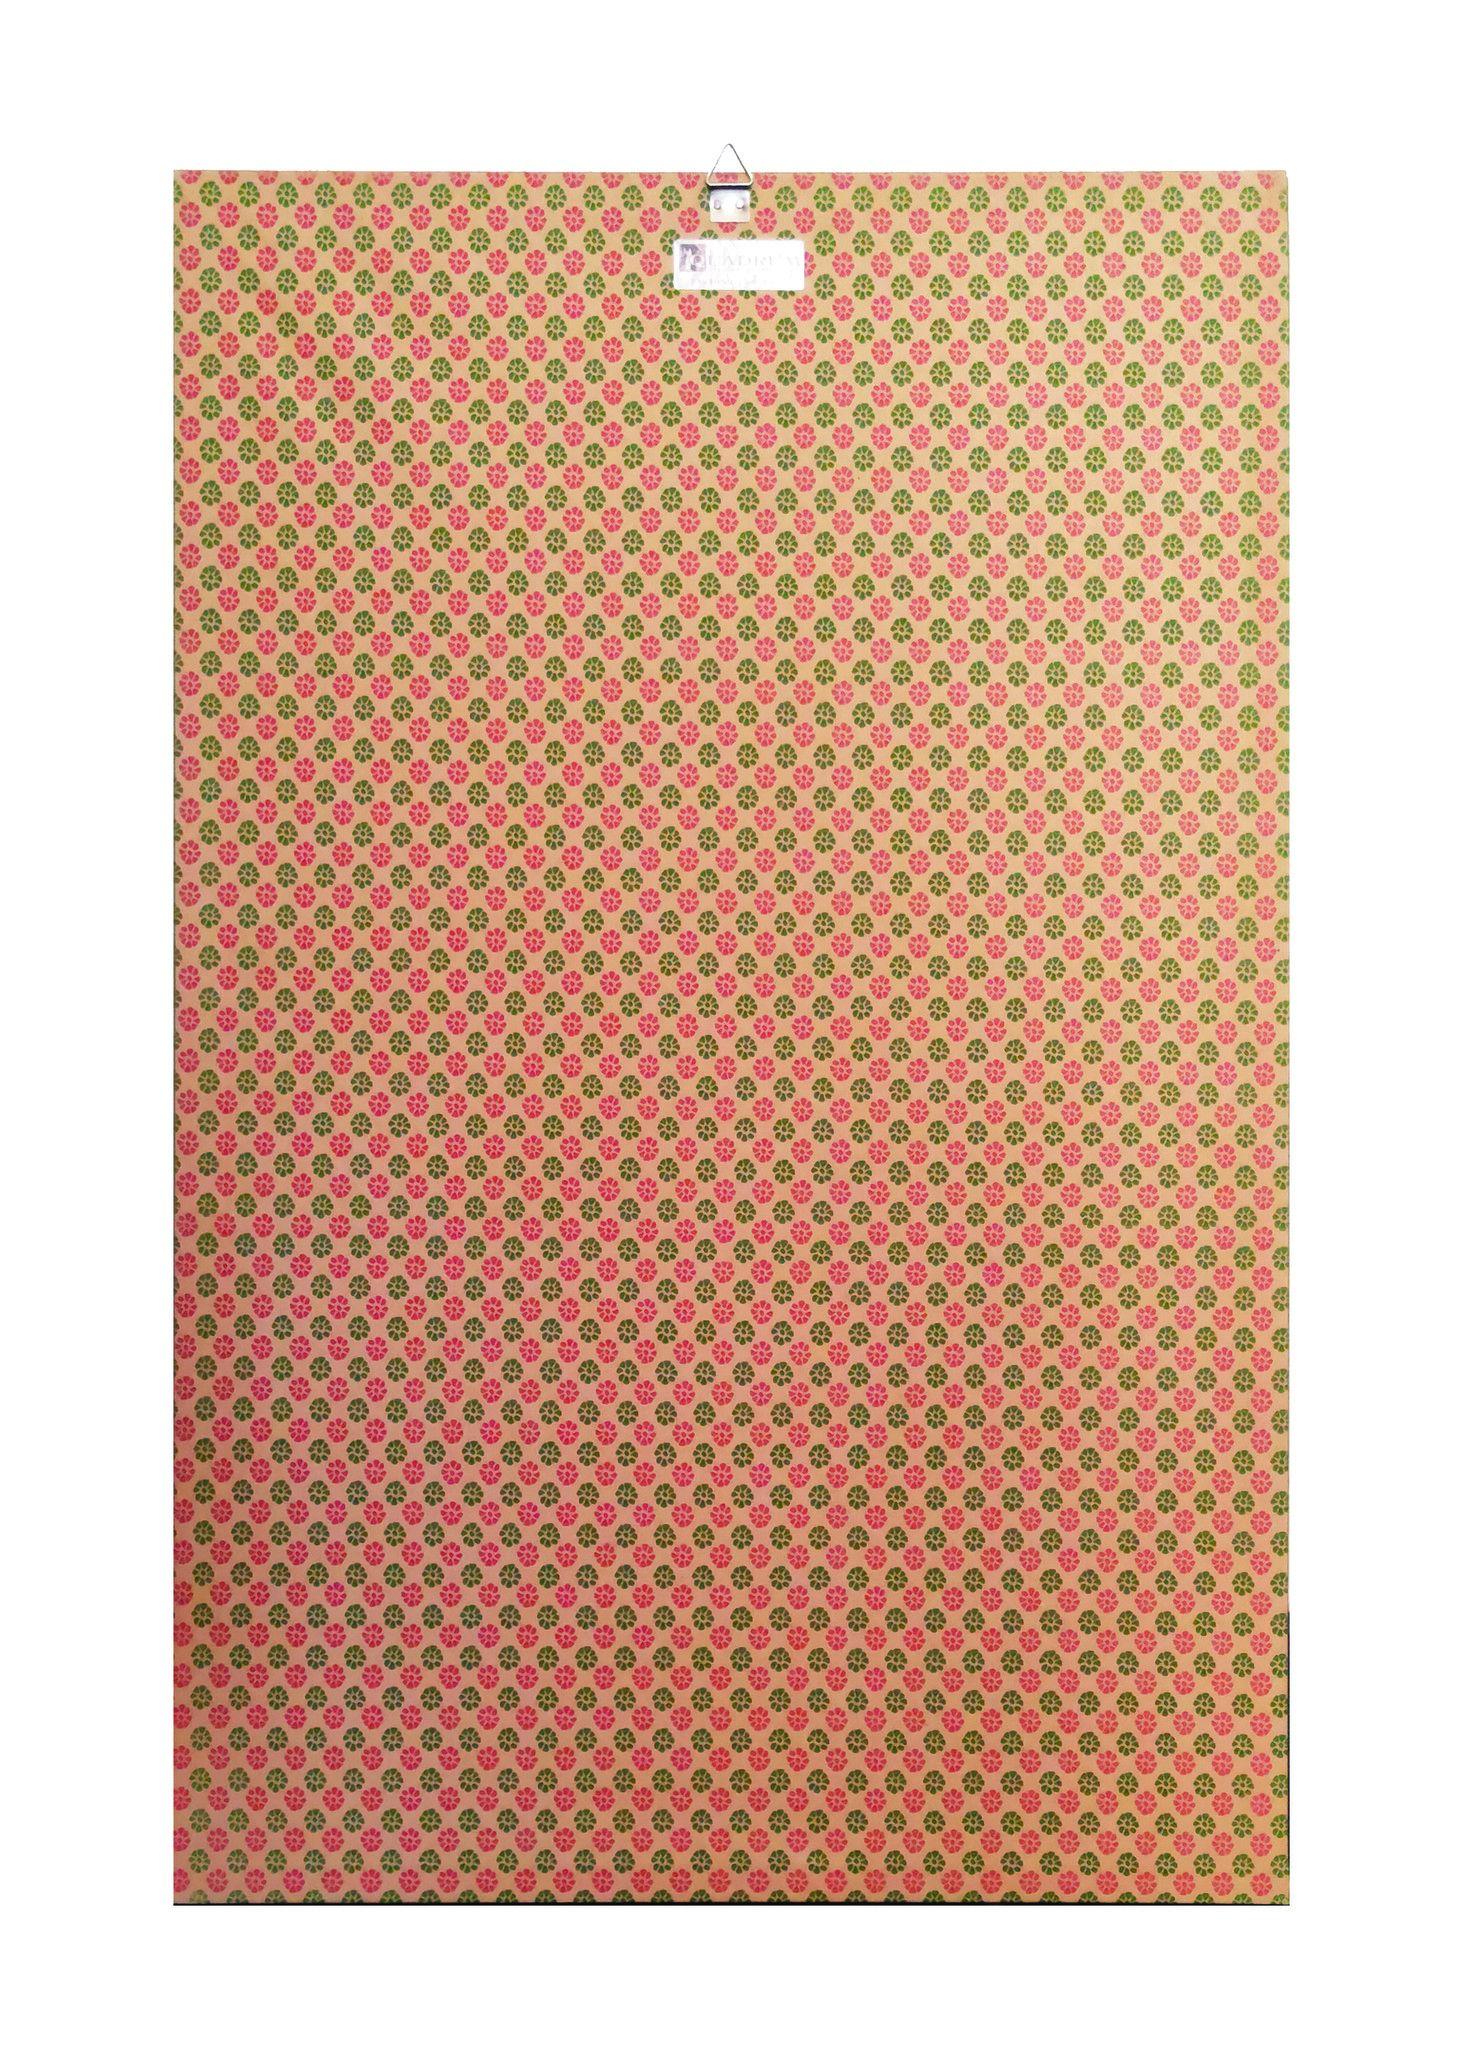 ACQUERELLO SU CARTA  VIVIAN  NARDUZZI ' GEISHA SAKURA SPRING '   dimensioni L 30 x H 40 cm.